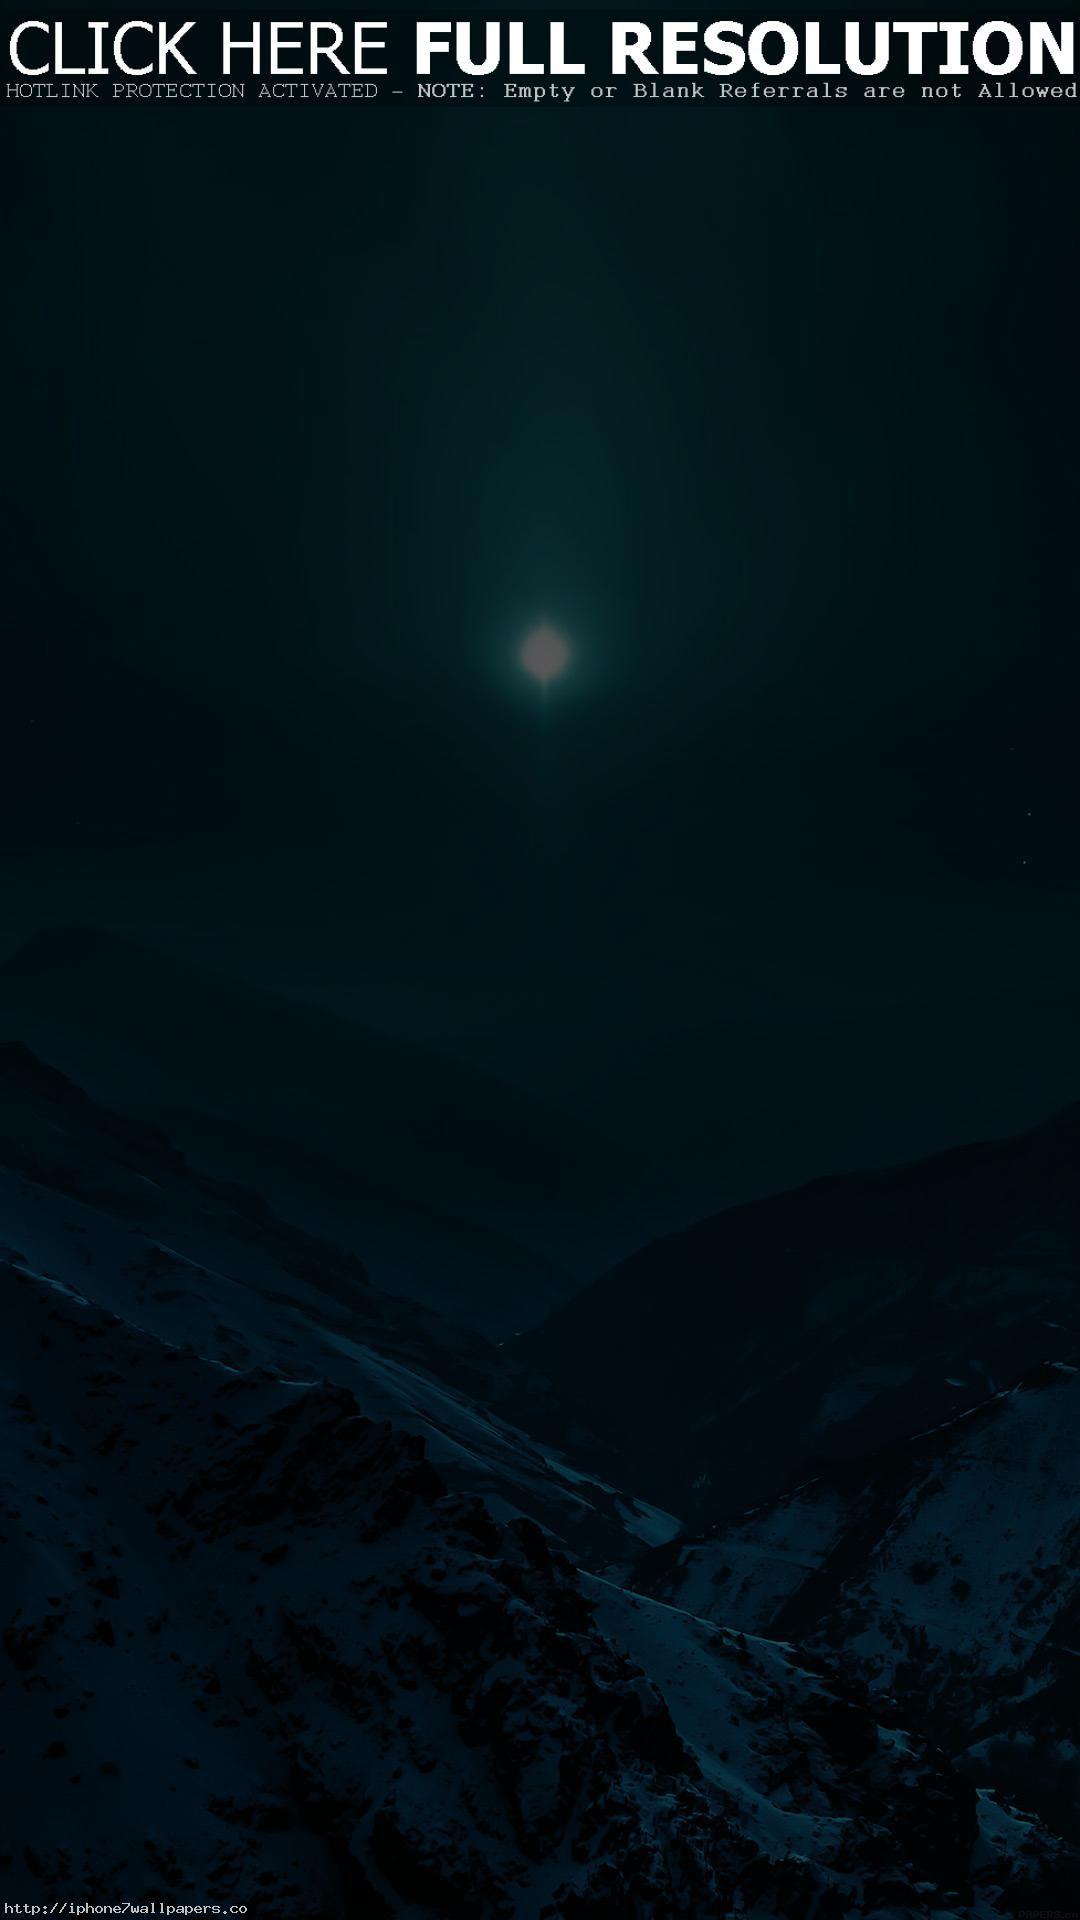 Wallpaper Nature Earth Asleep Mountain Night Android wallpaper – Android HD  wallpapers